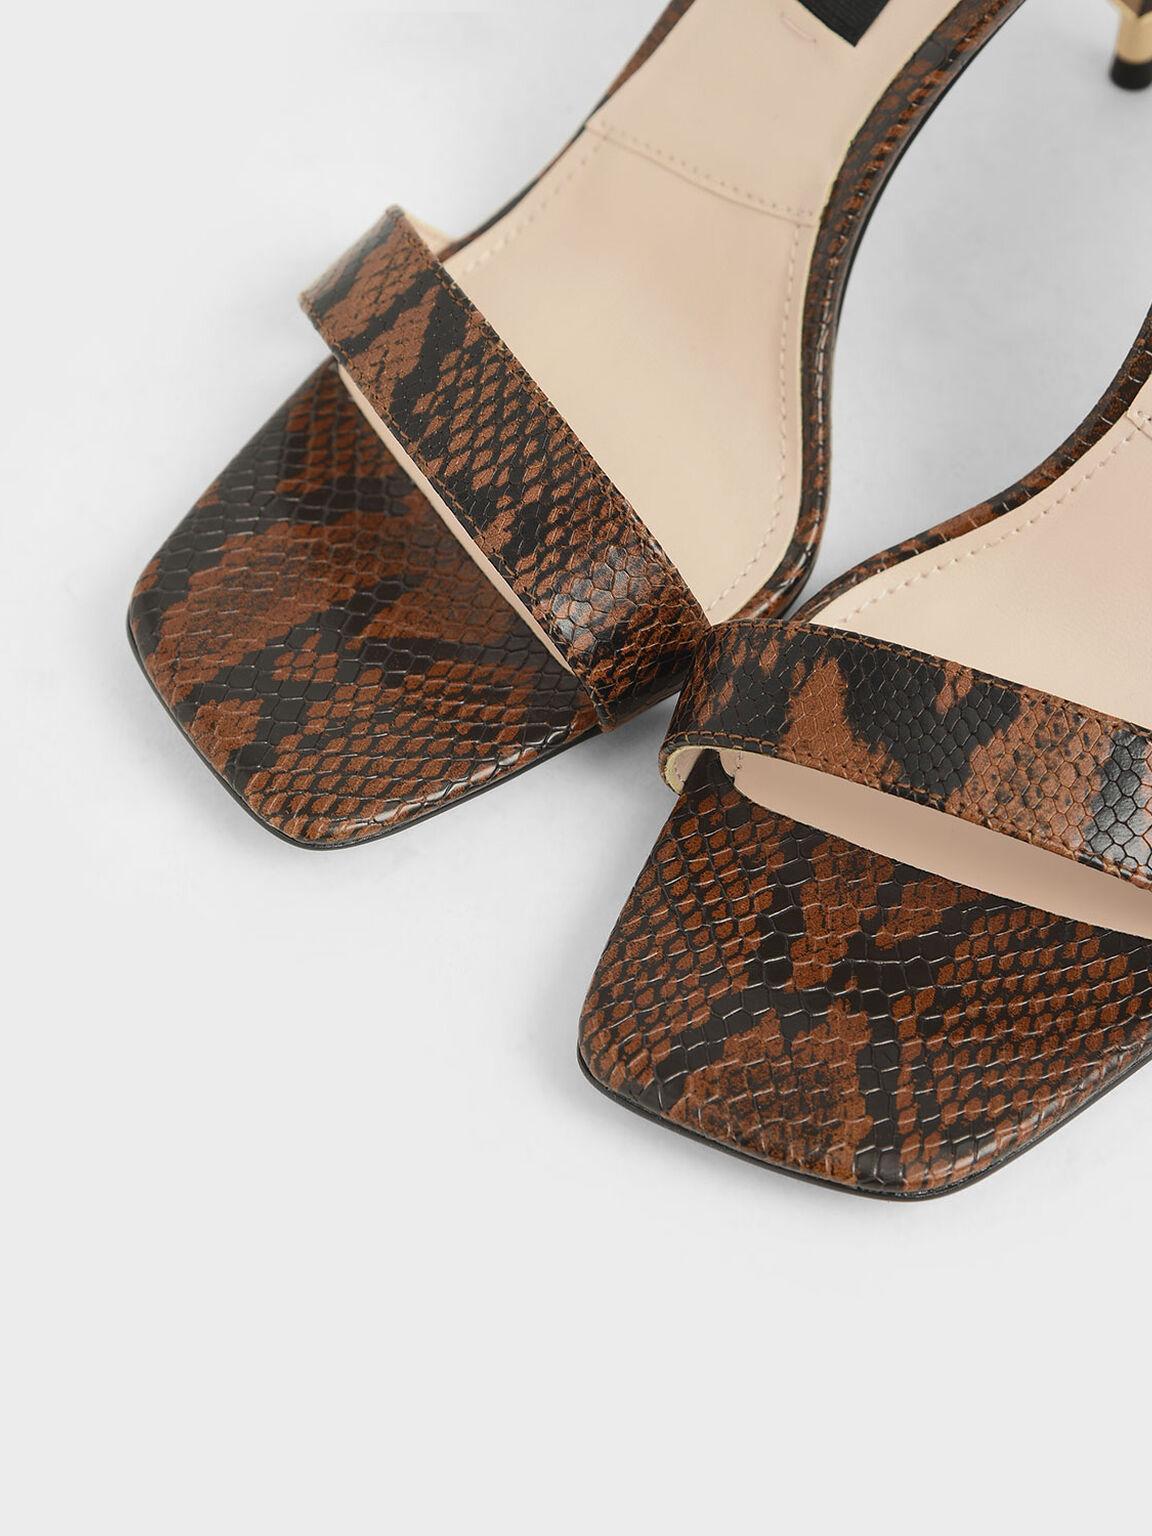 Snake Print Leather Stiletto Heels, Multi, hi-res